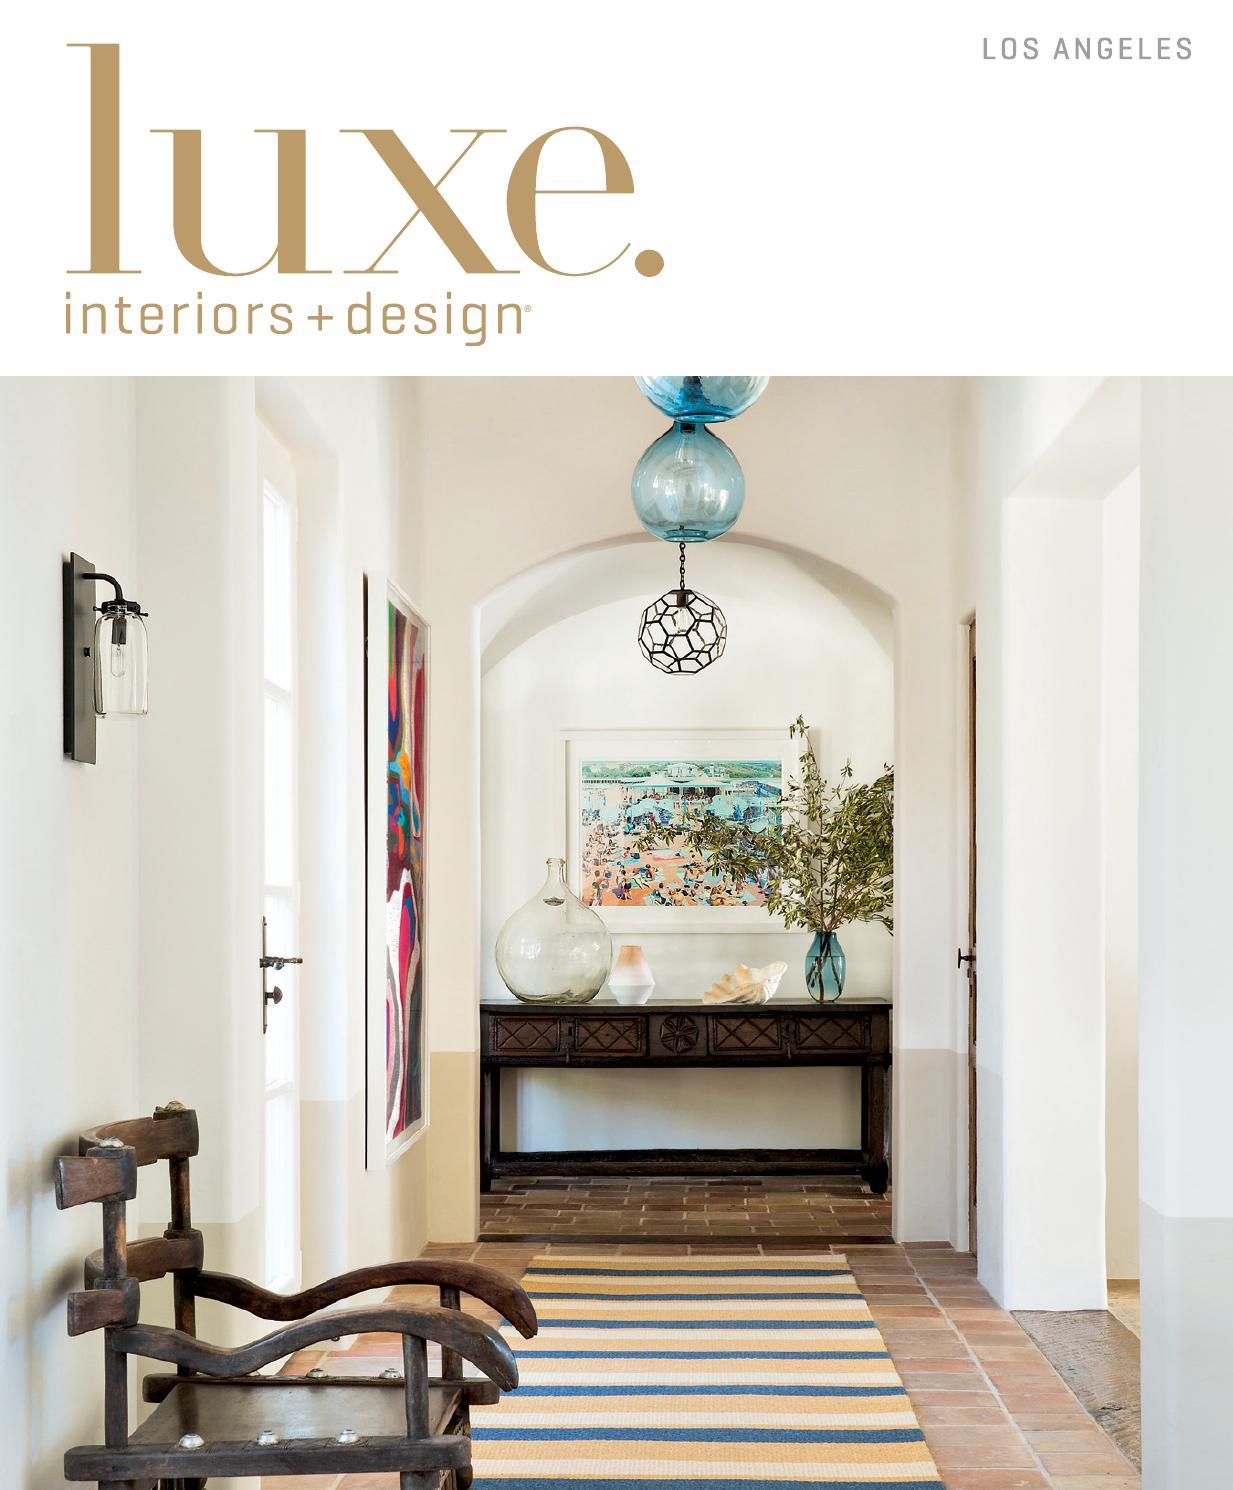 Luxe Magazine Summer 2015 Los Angeles by SANDOW® - issuu